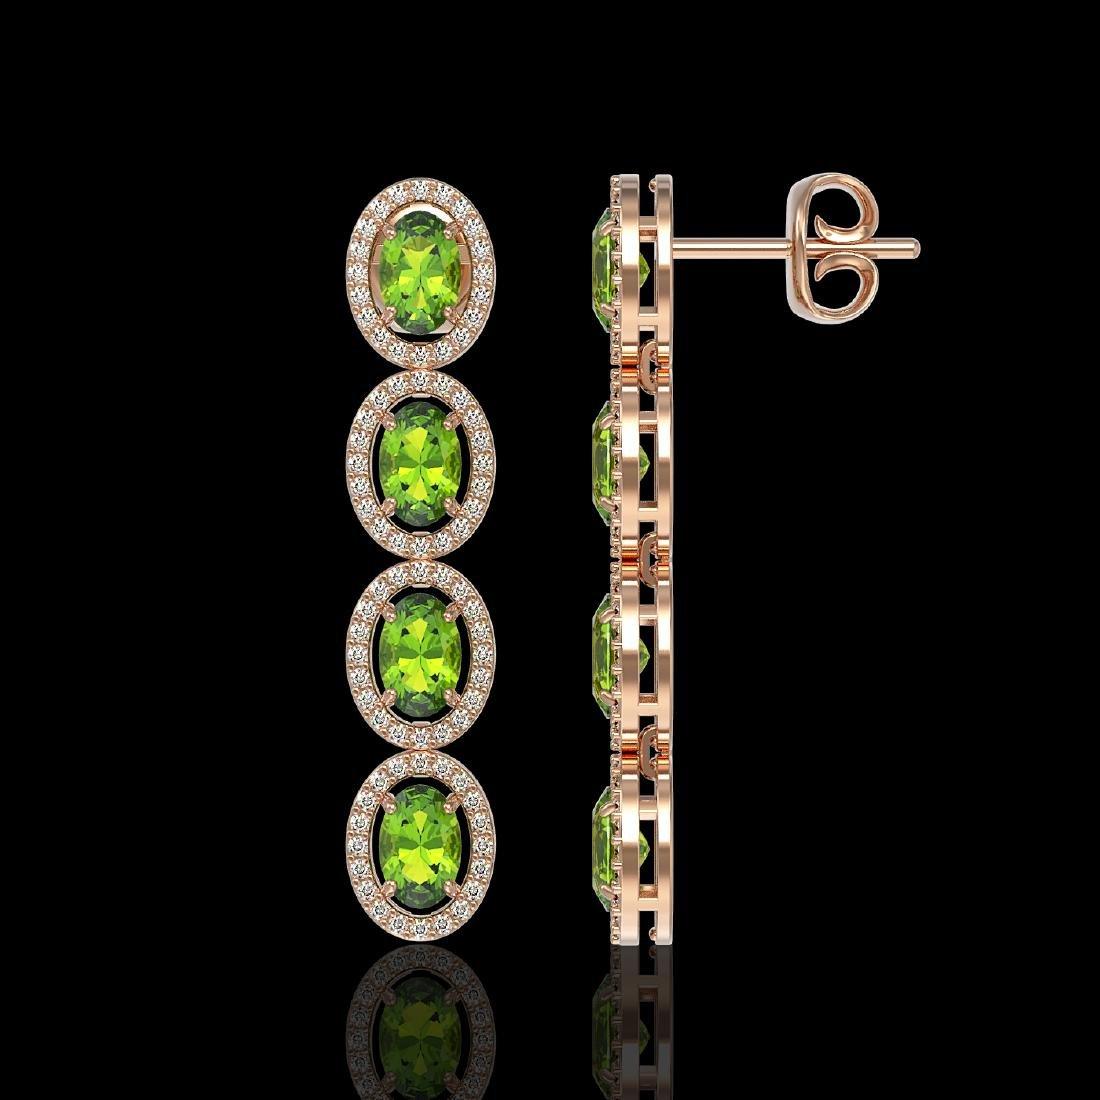 5.88 CTW Peridot & Diamond Halo Earrings 10K Rose Gold - 2